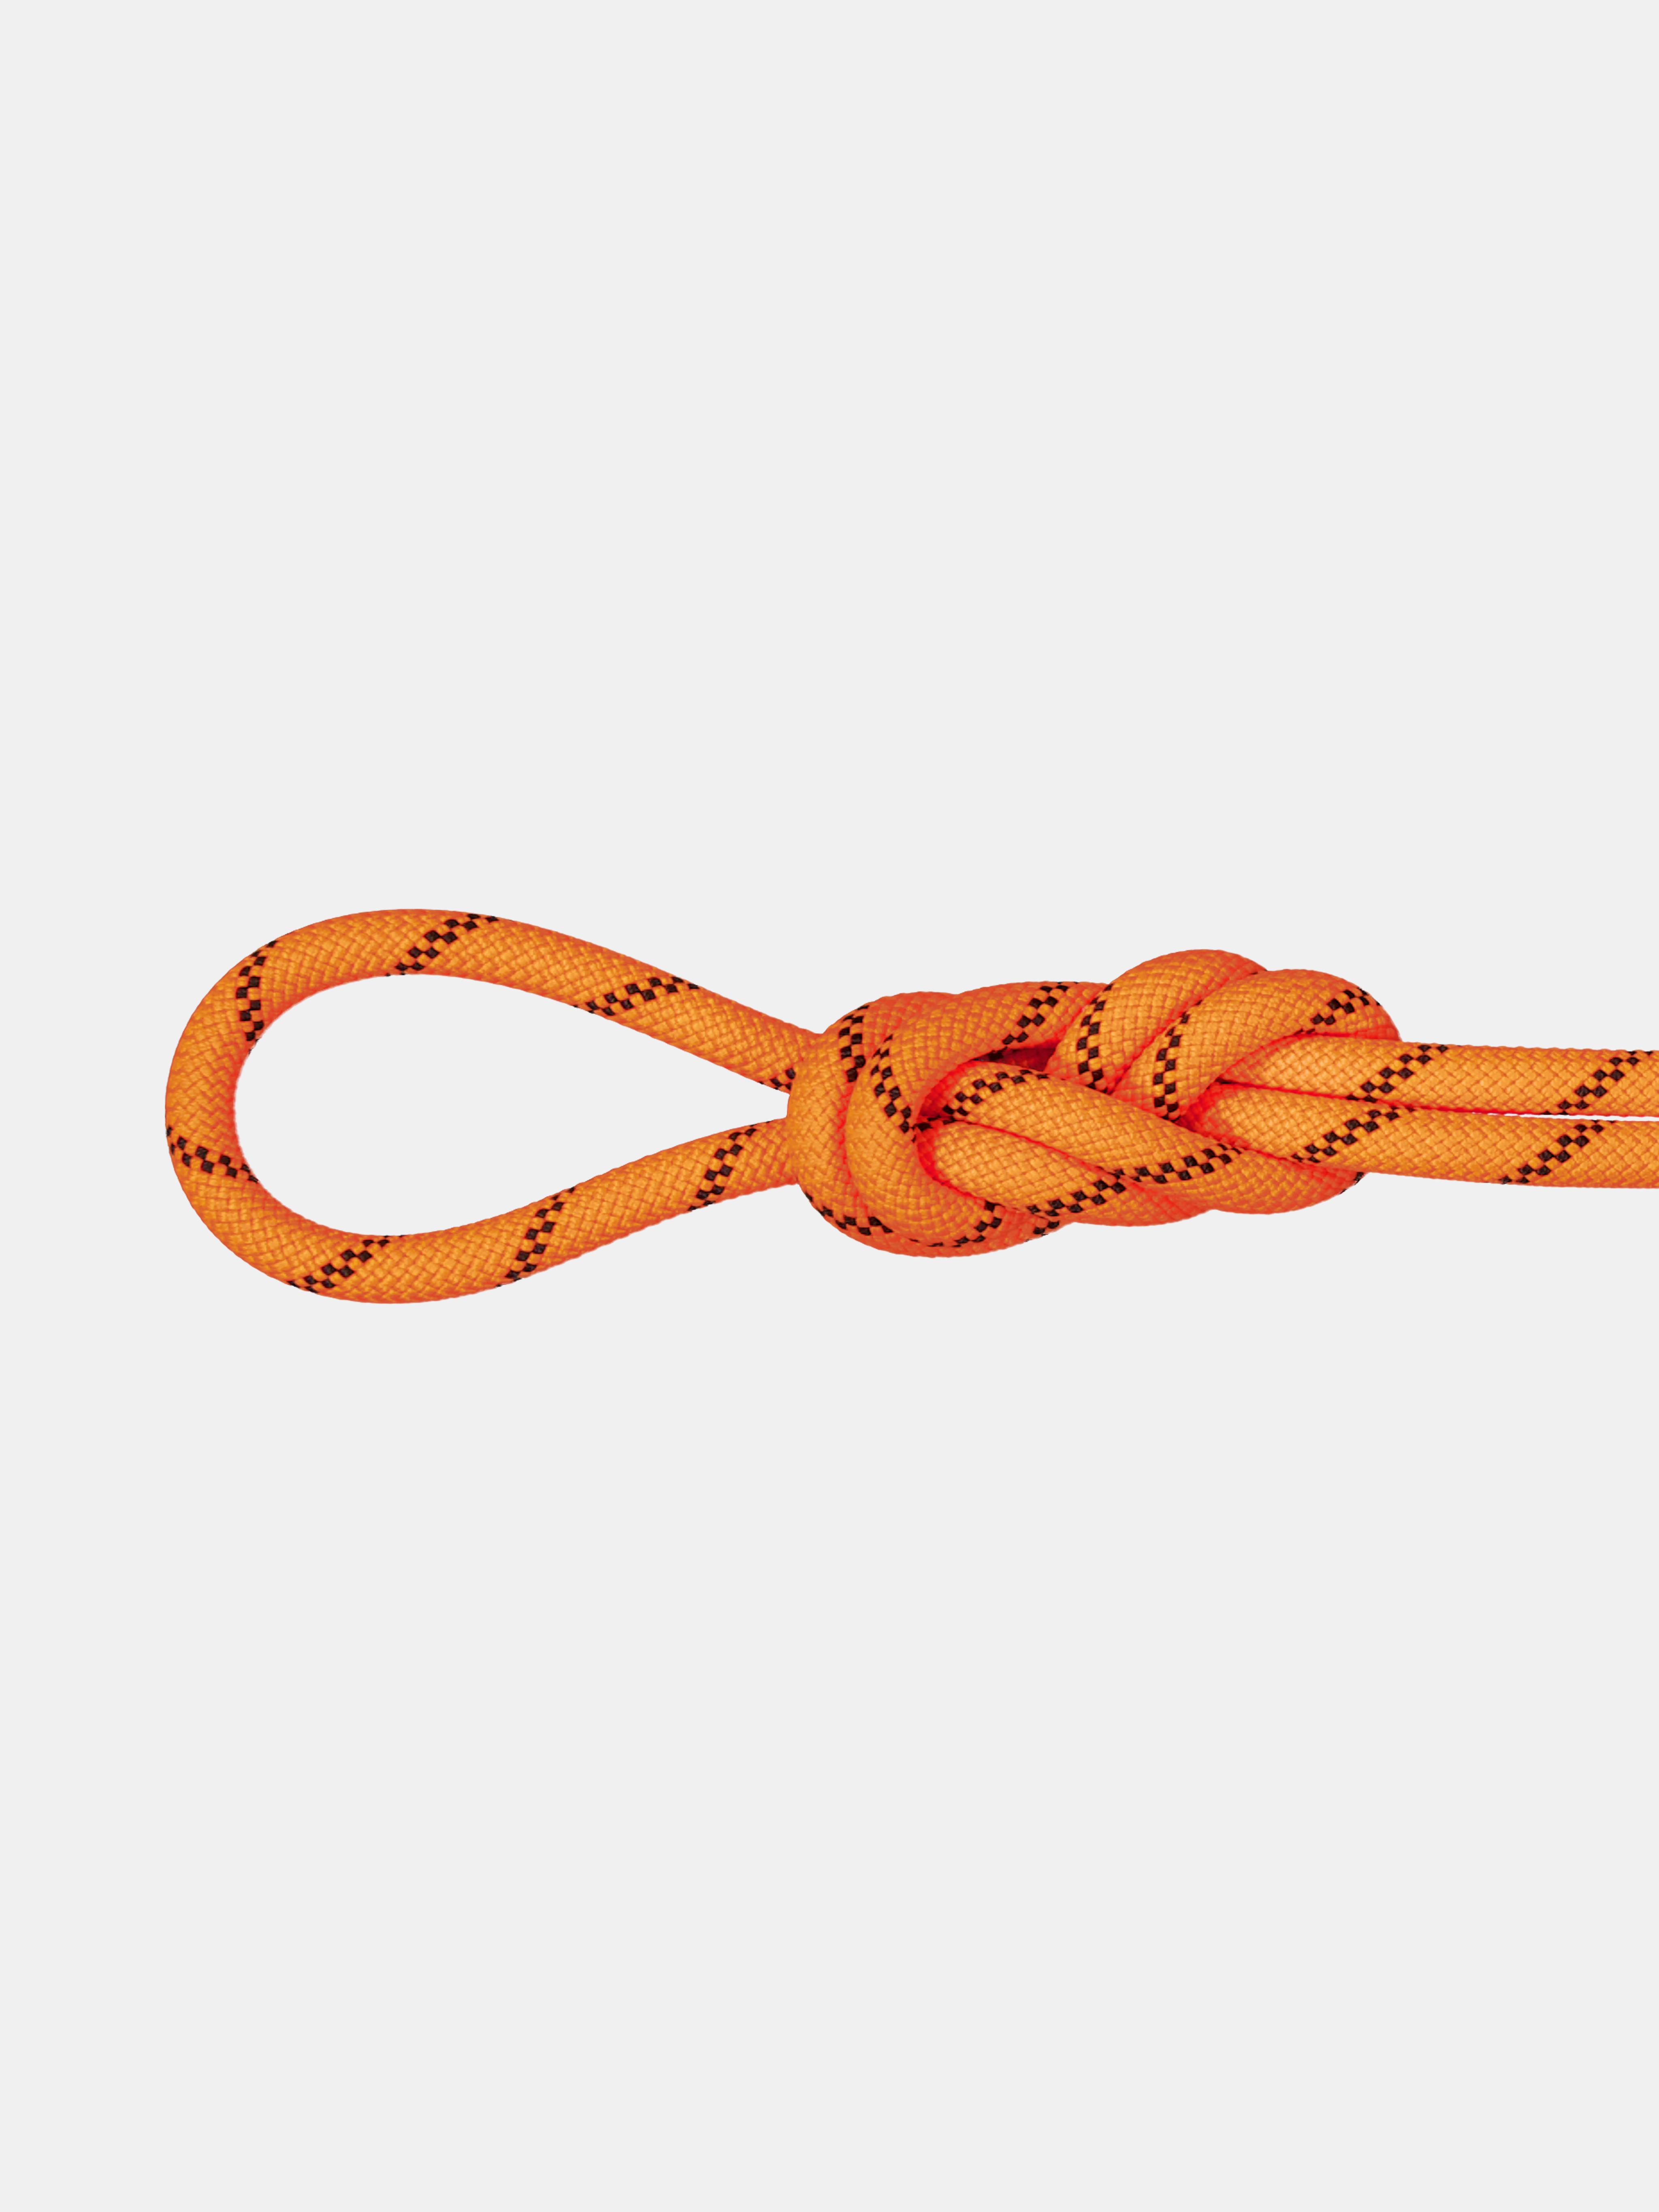 8.7 Alpine Sender Dry Rope thumbnail